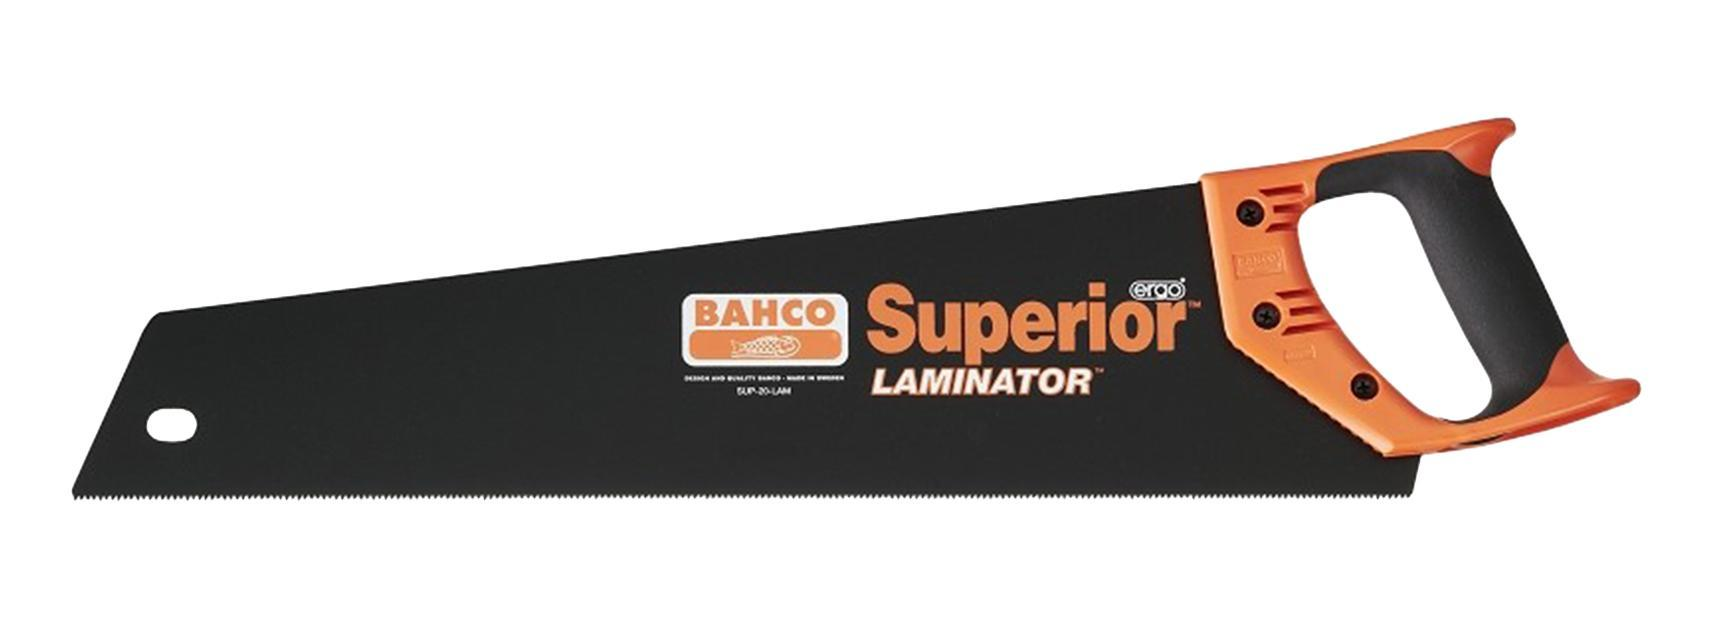 Ножовка Bahco Sup-20-lam ножовка bahco 500мм laminator pc 20 lam